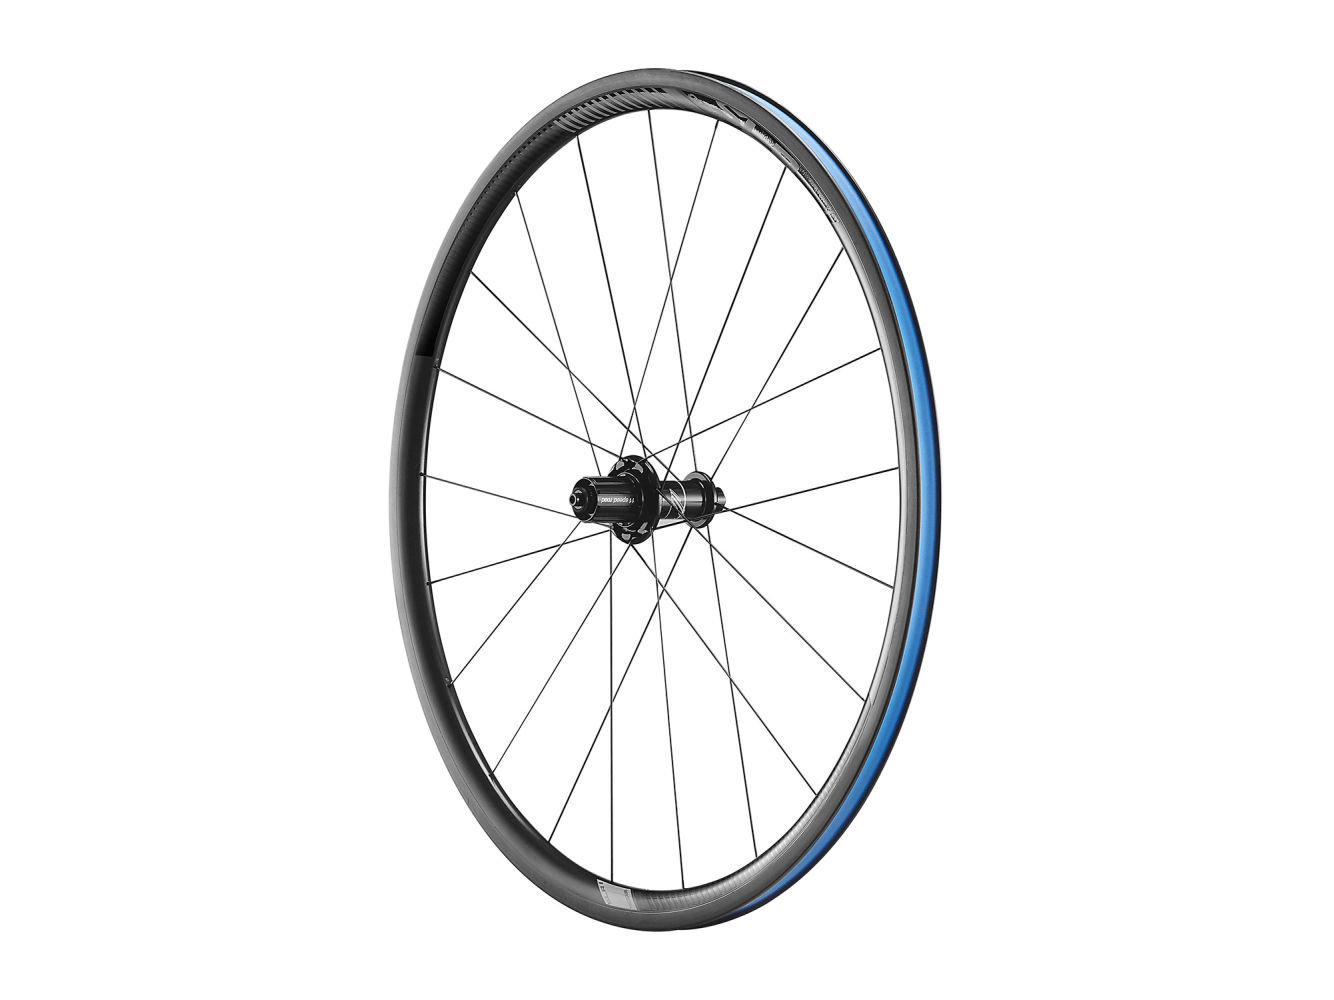 Giant Slr 0 30mm Carbon Climbing Road Wheels 700c Rear